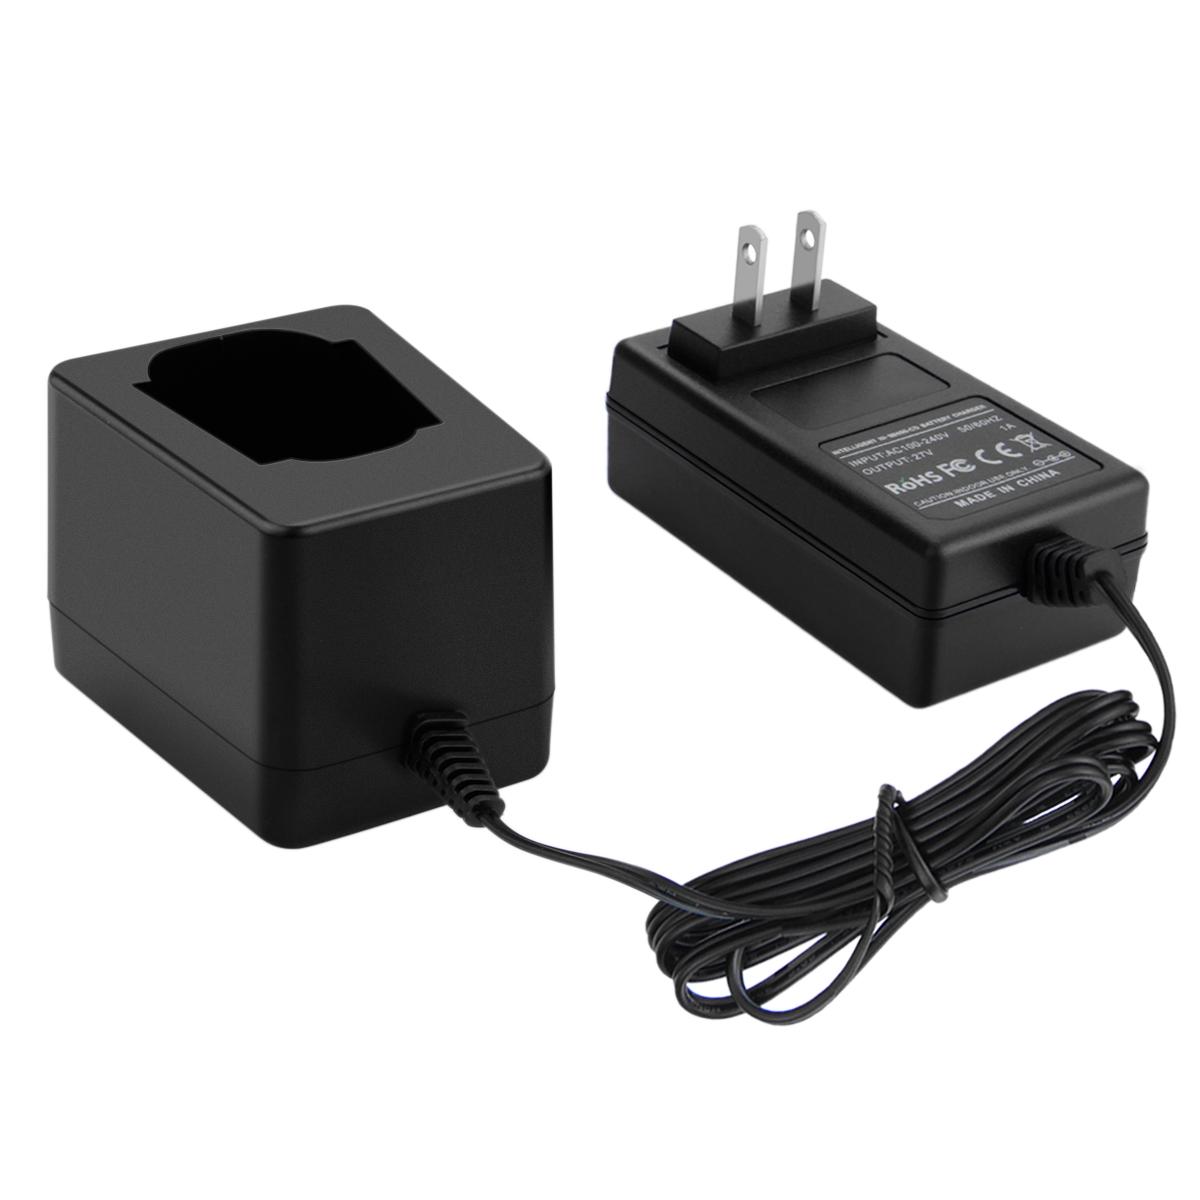 Premium Batterie Chargeur Ni-MH NI-CD bureau pour Metabo 6.31746 6.31775 me974